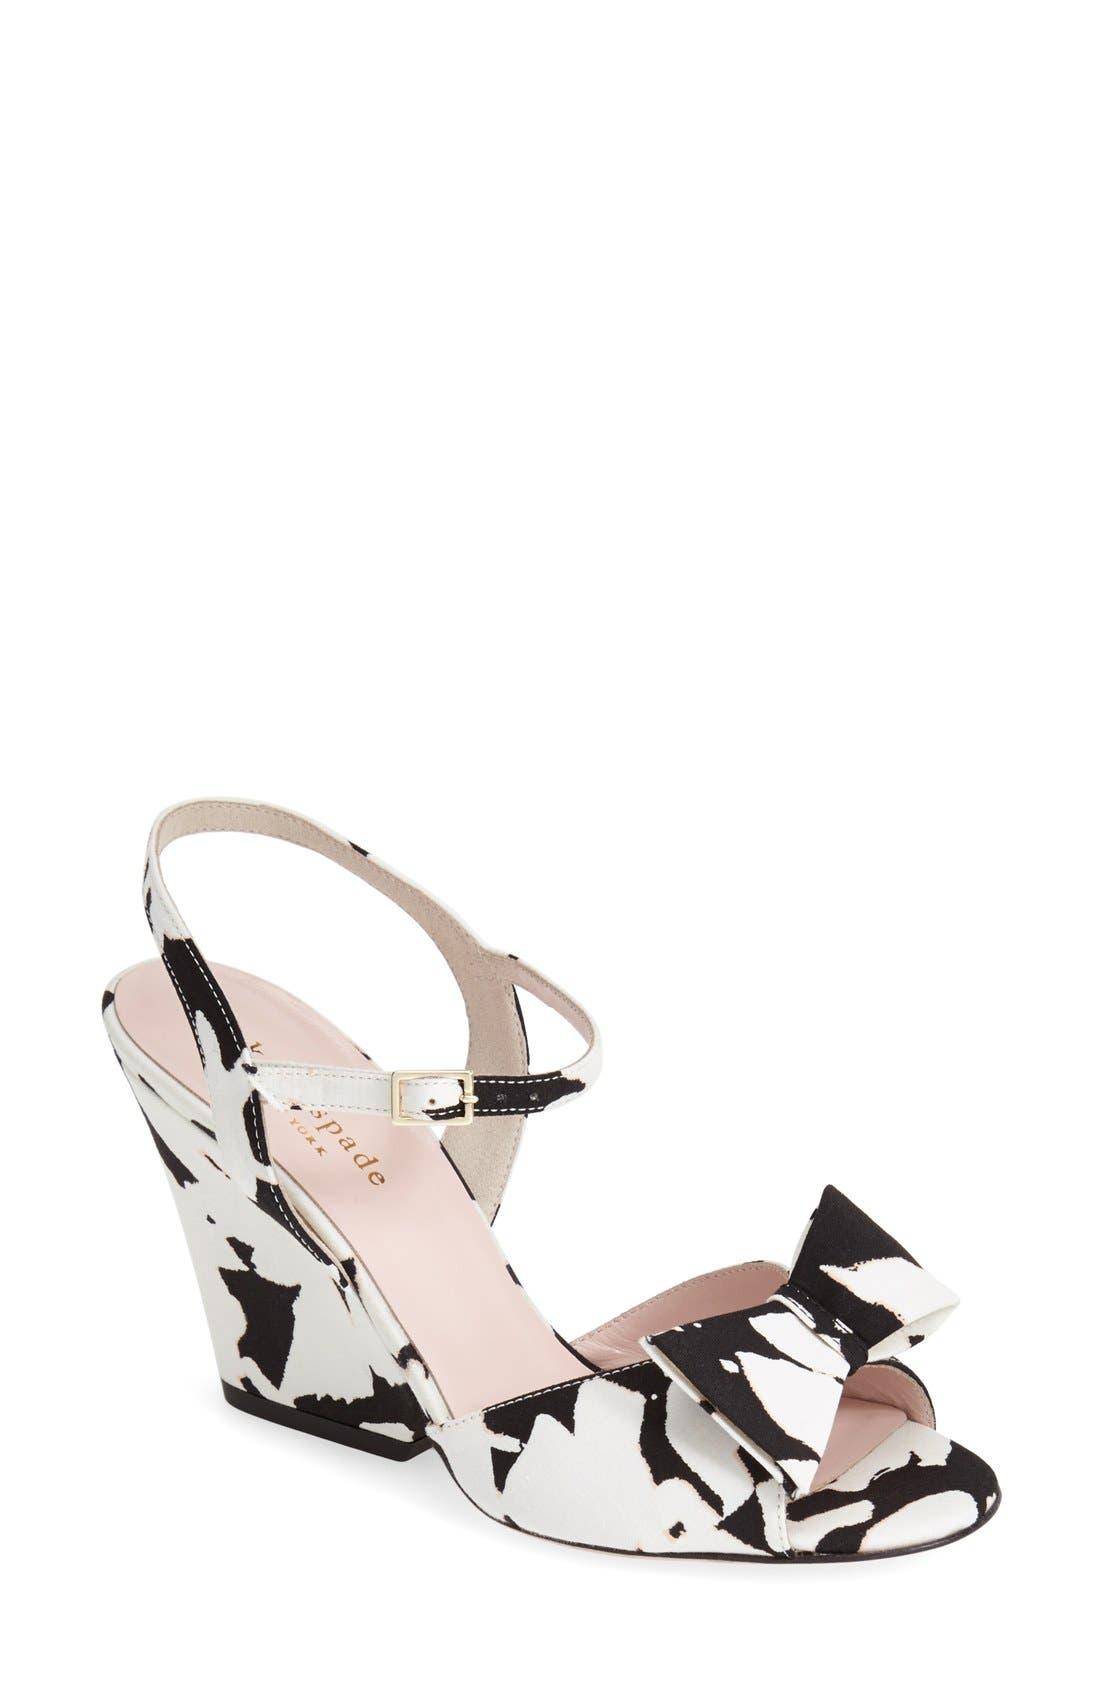 KATE SPADE NEW YORK 'imari' satin ankle strap sandal, Main, color, 001